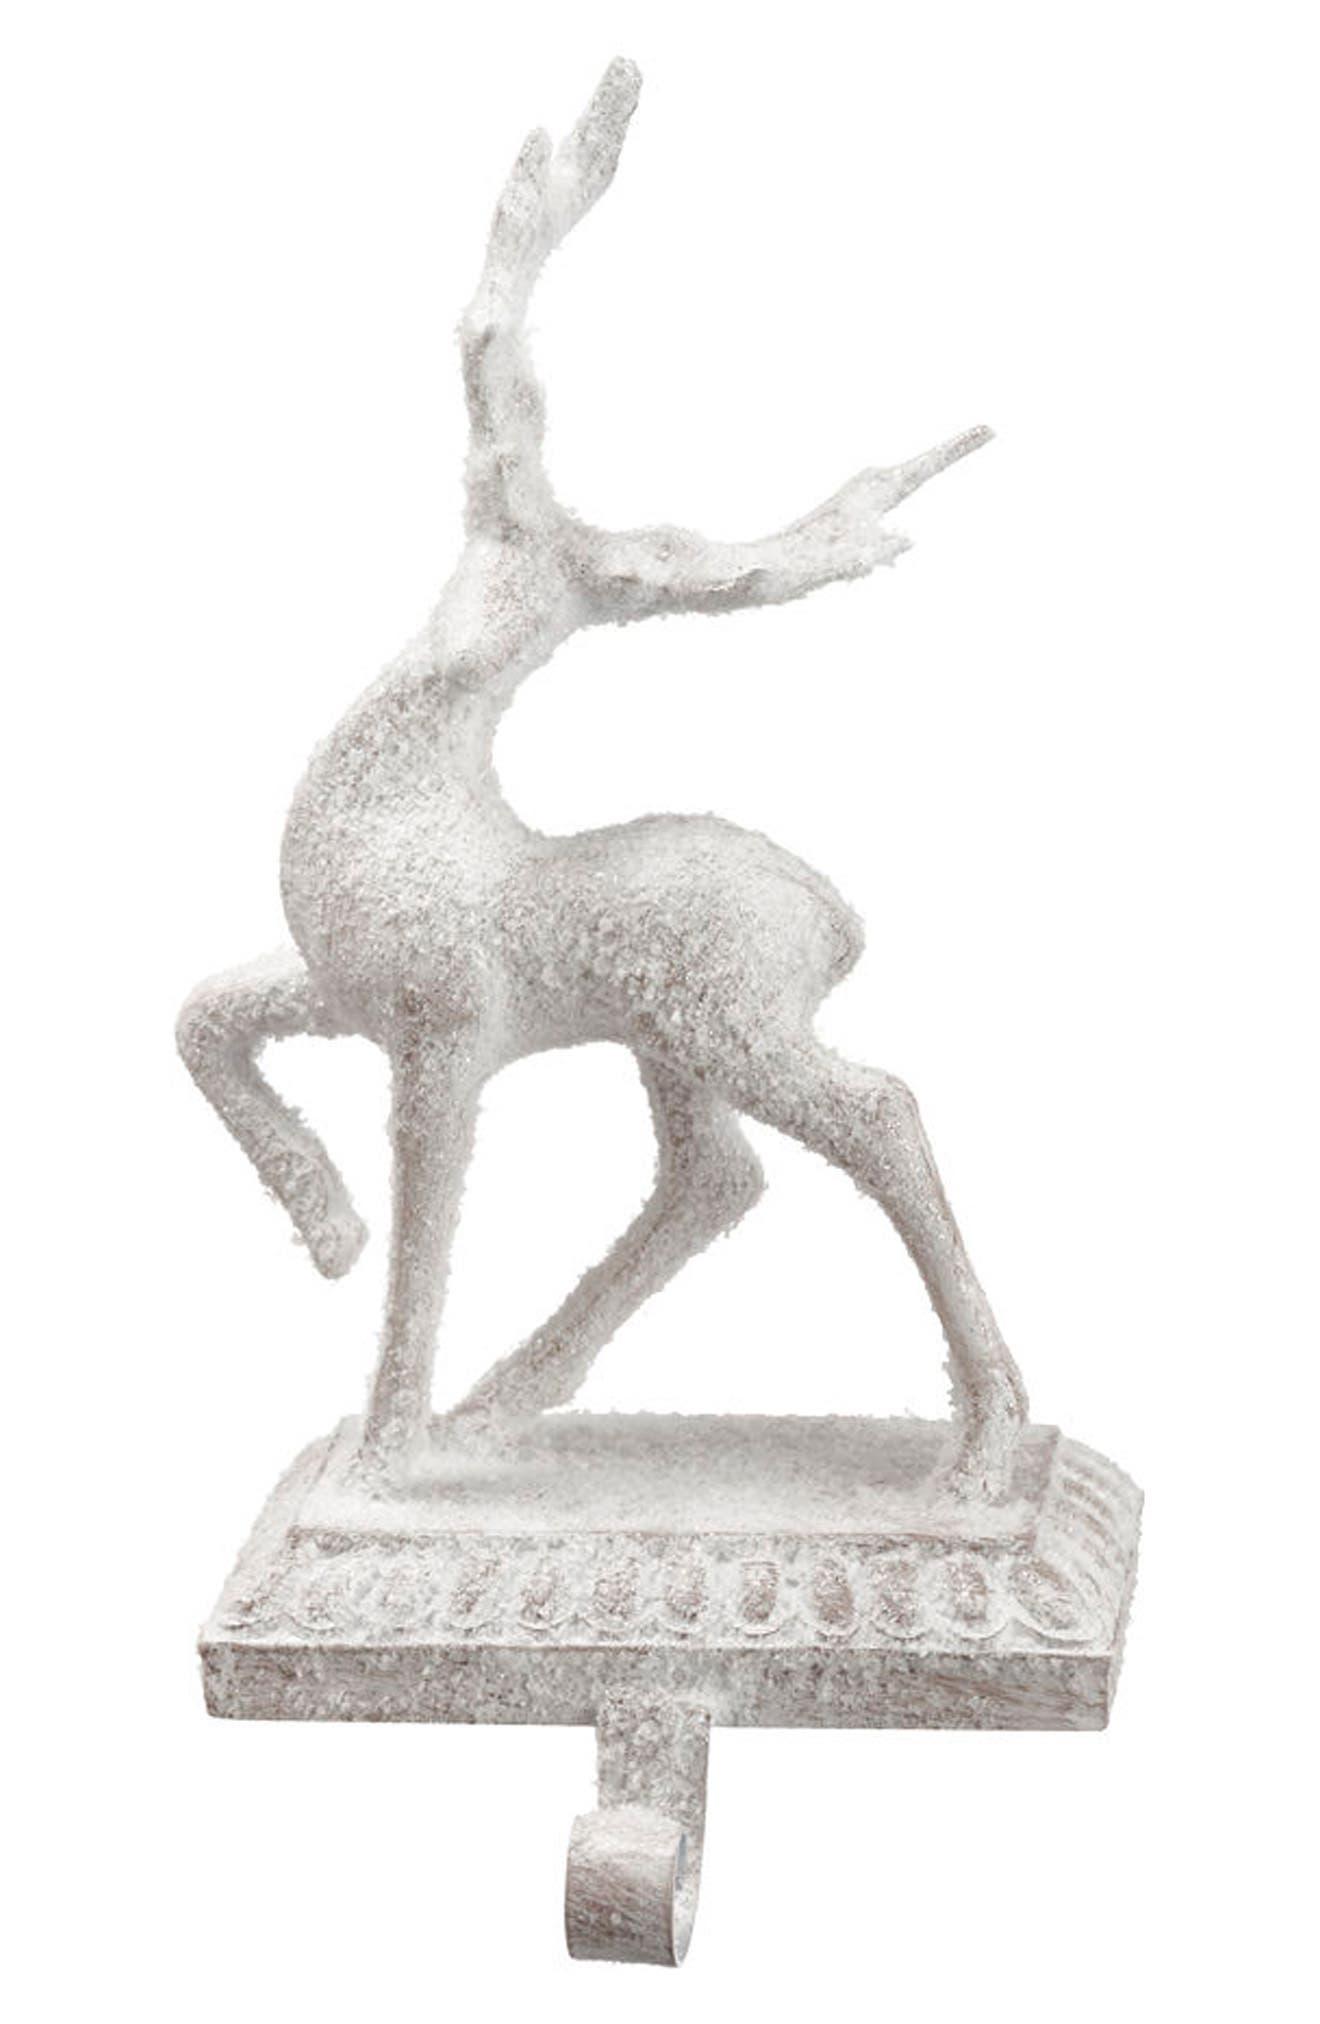 Main Image - ALLSTATE Reindeer Stocking Holder